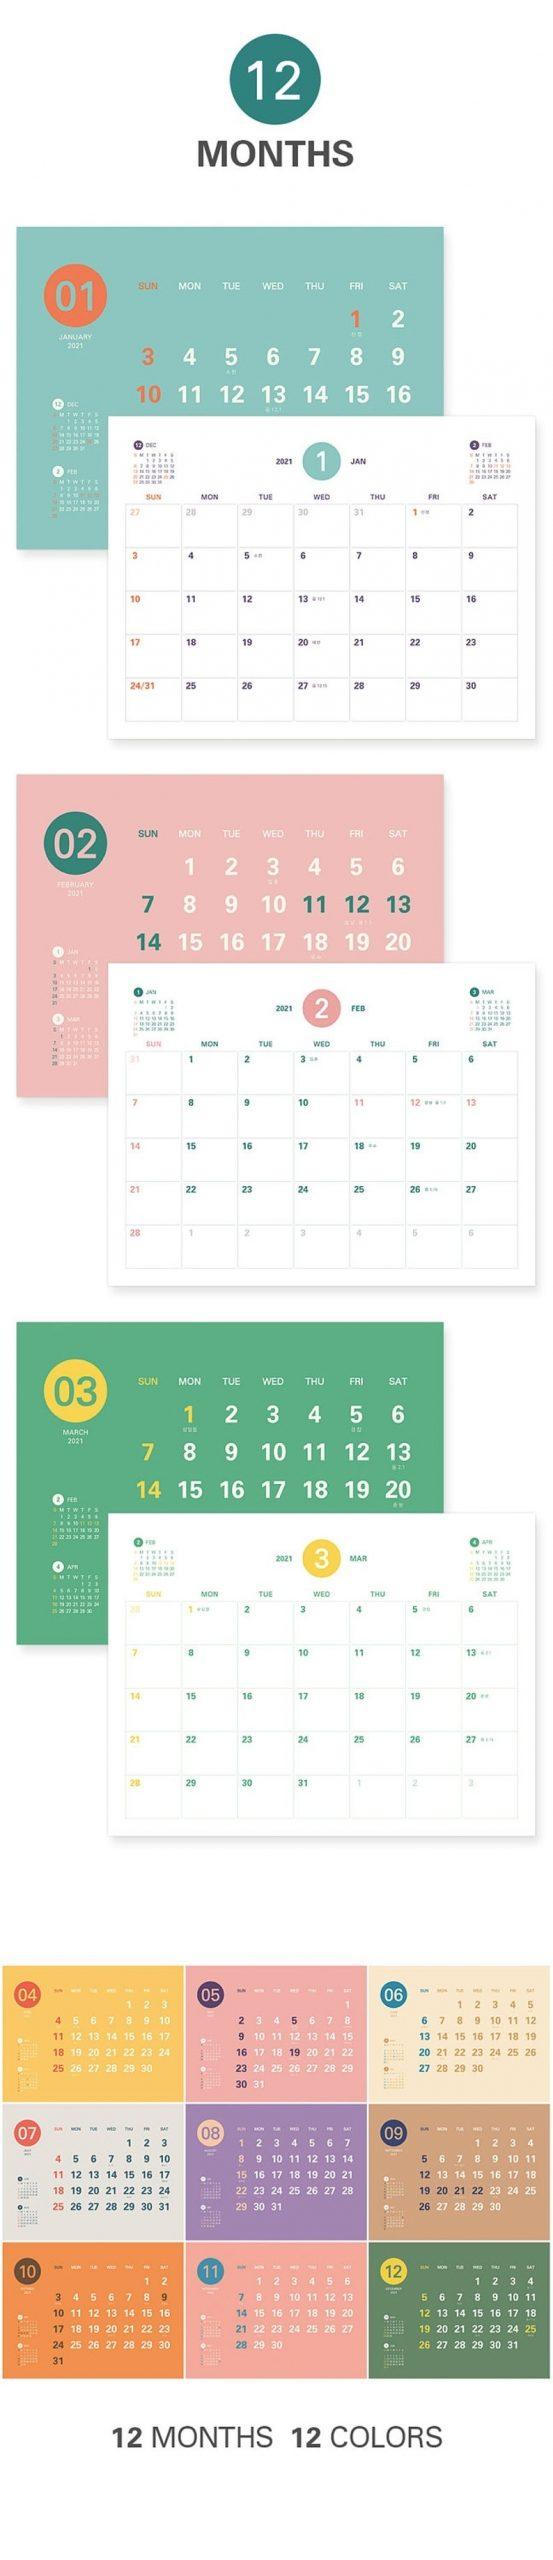 2021 Desk Calendar 2021 Calendar Desk Schedule 2021 | Etsy